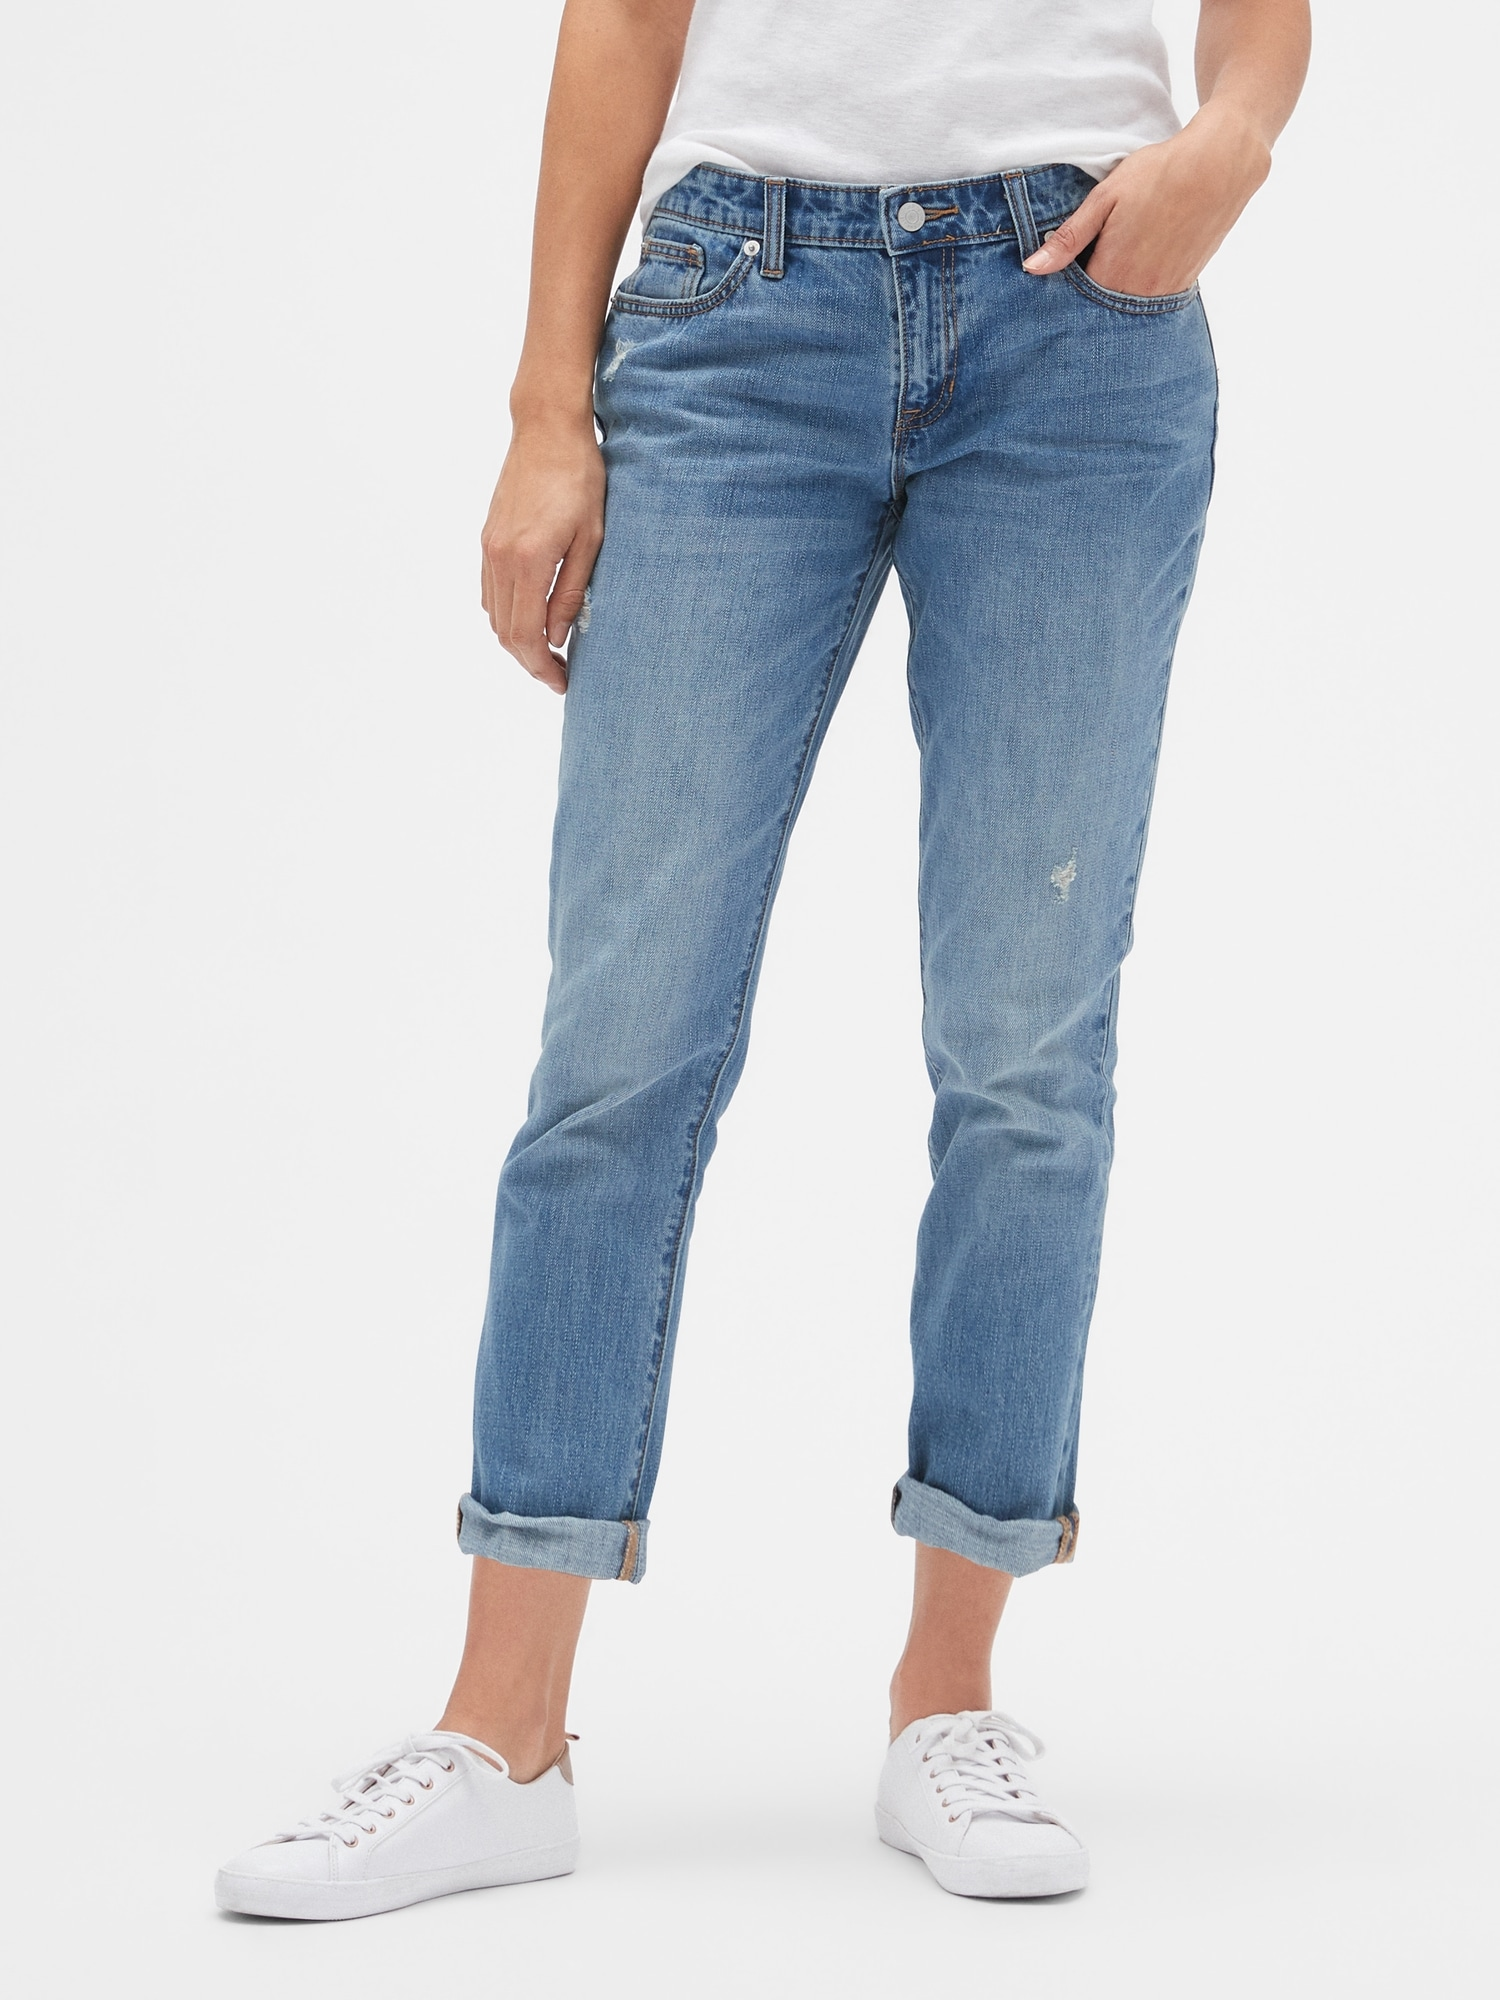 Girlfriend jeans vs boyfriend jeans, boyfriend jeans fit